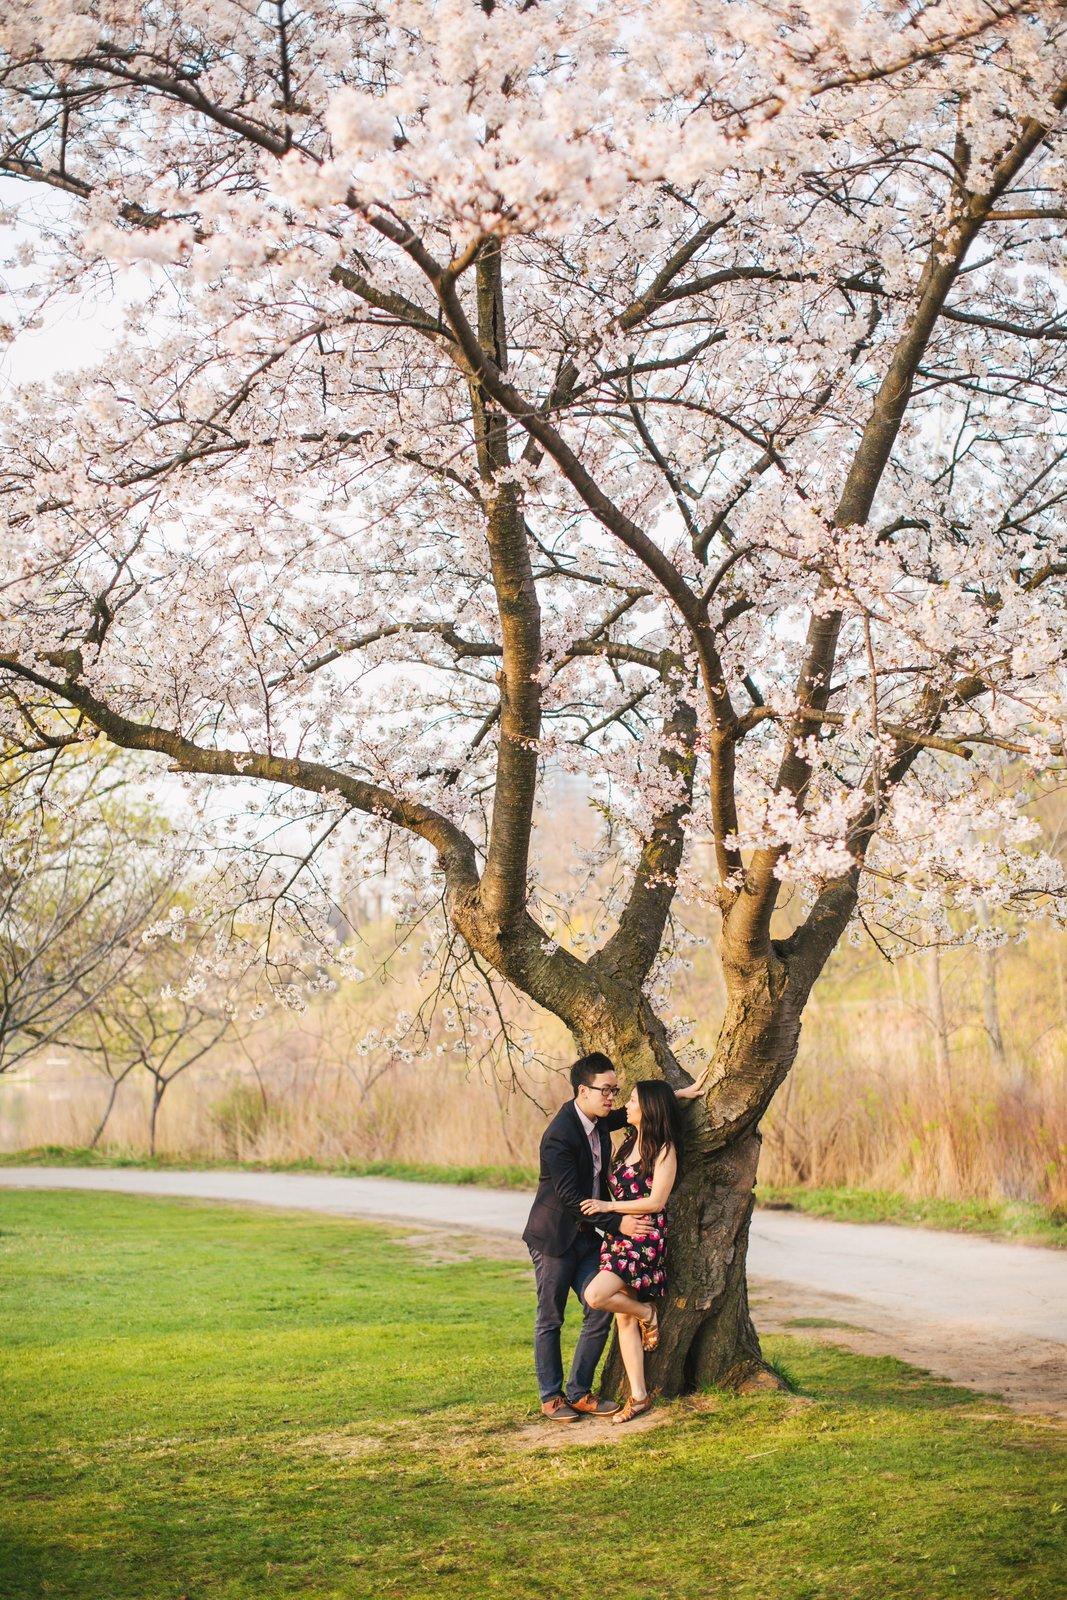 Jessica-Charles-Engagement-High-Park-Cherry-Blossom-012